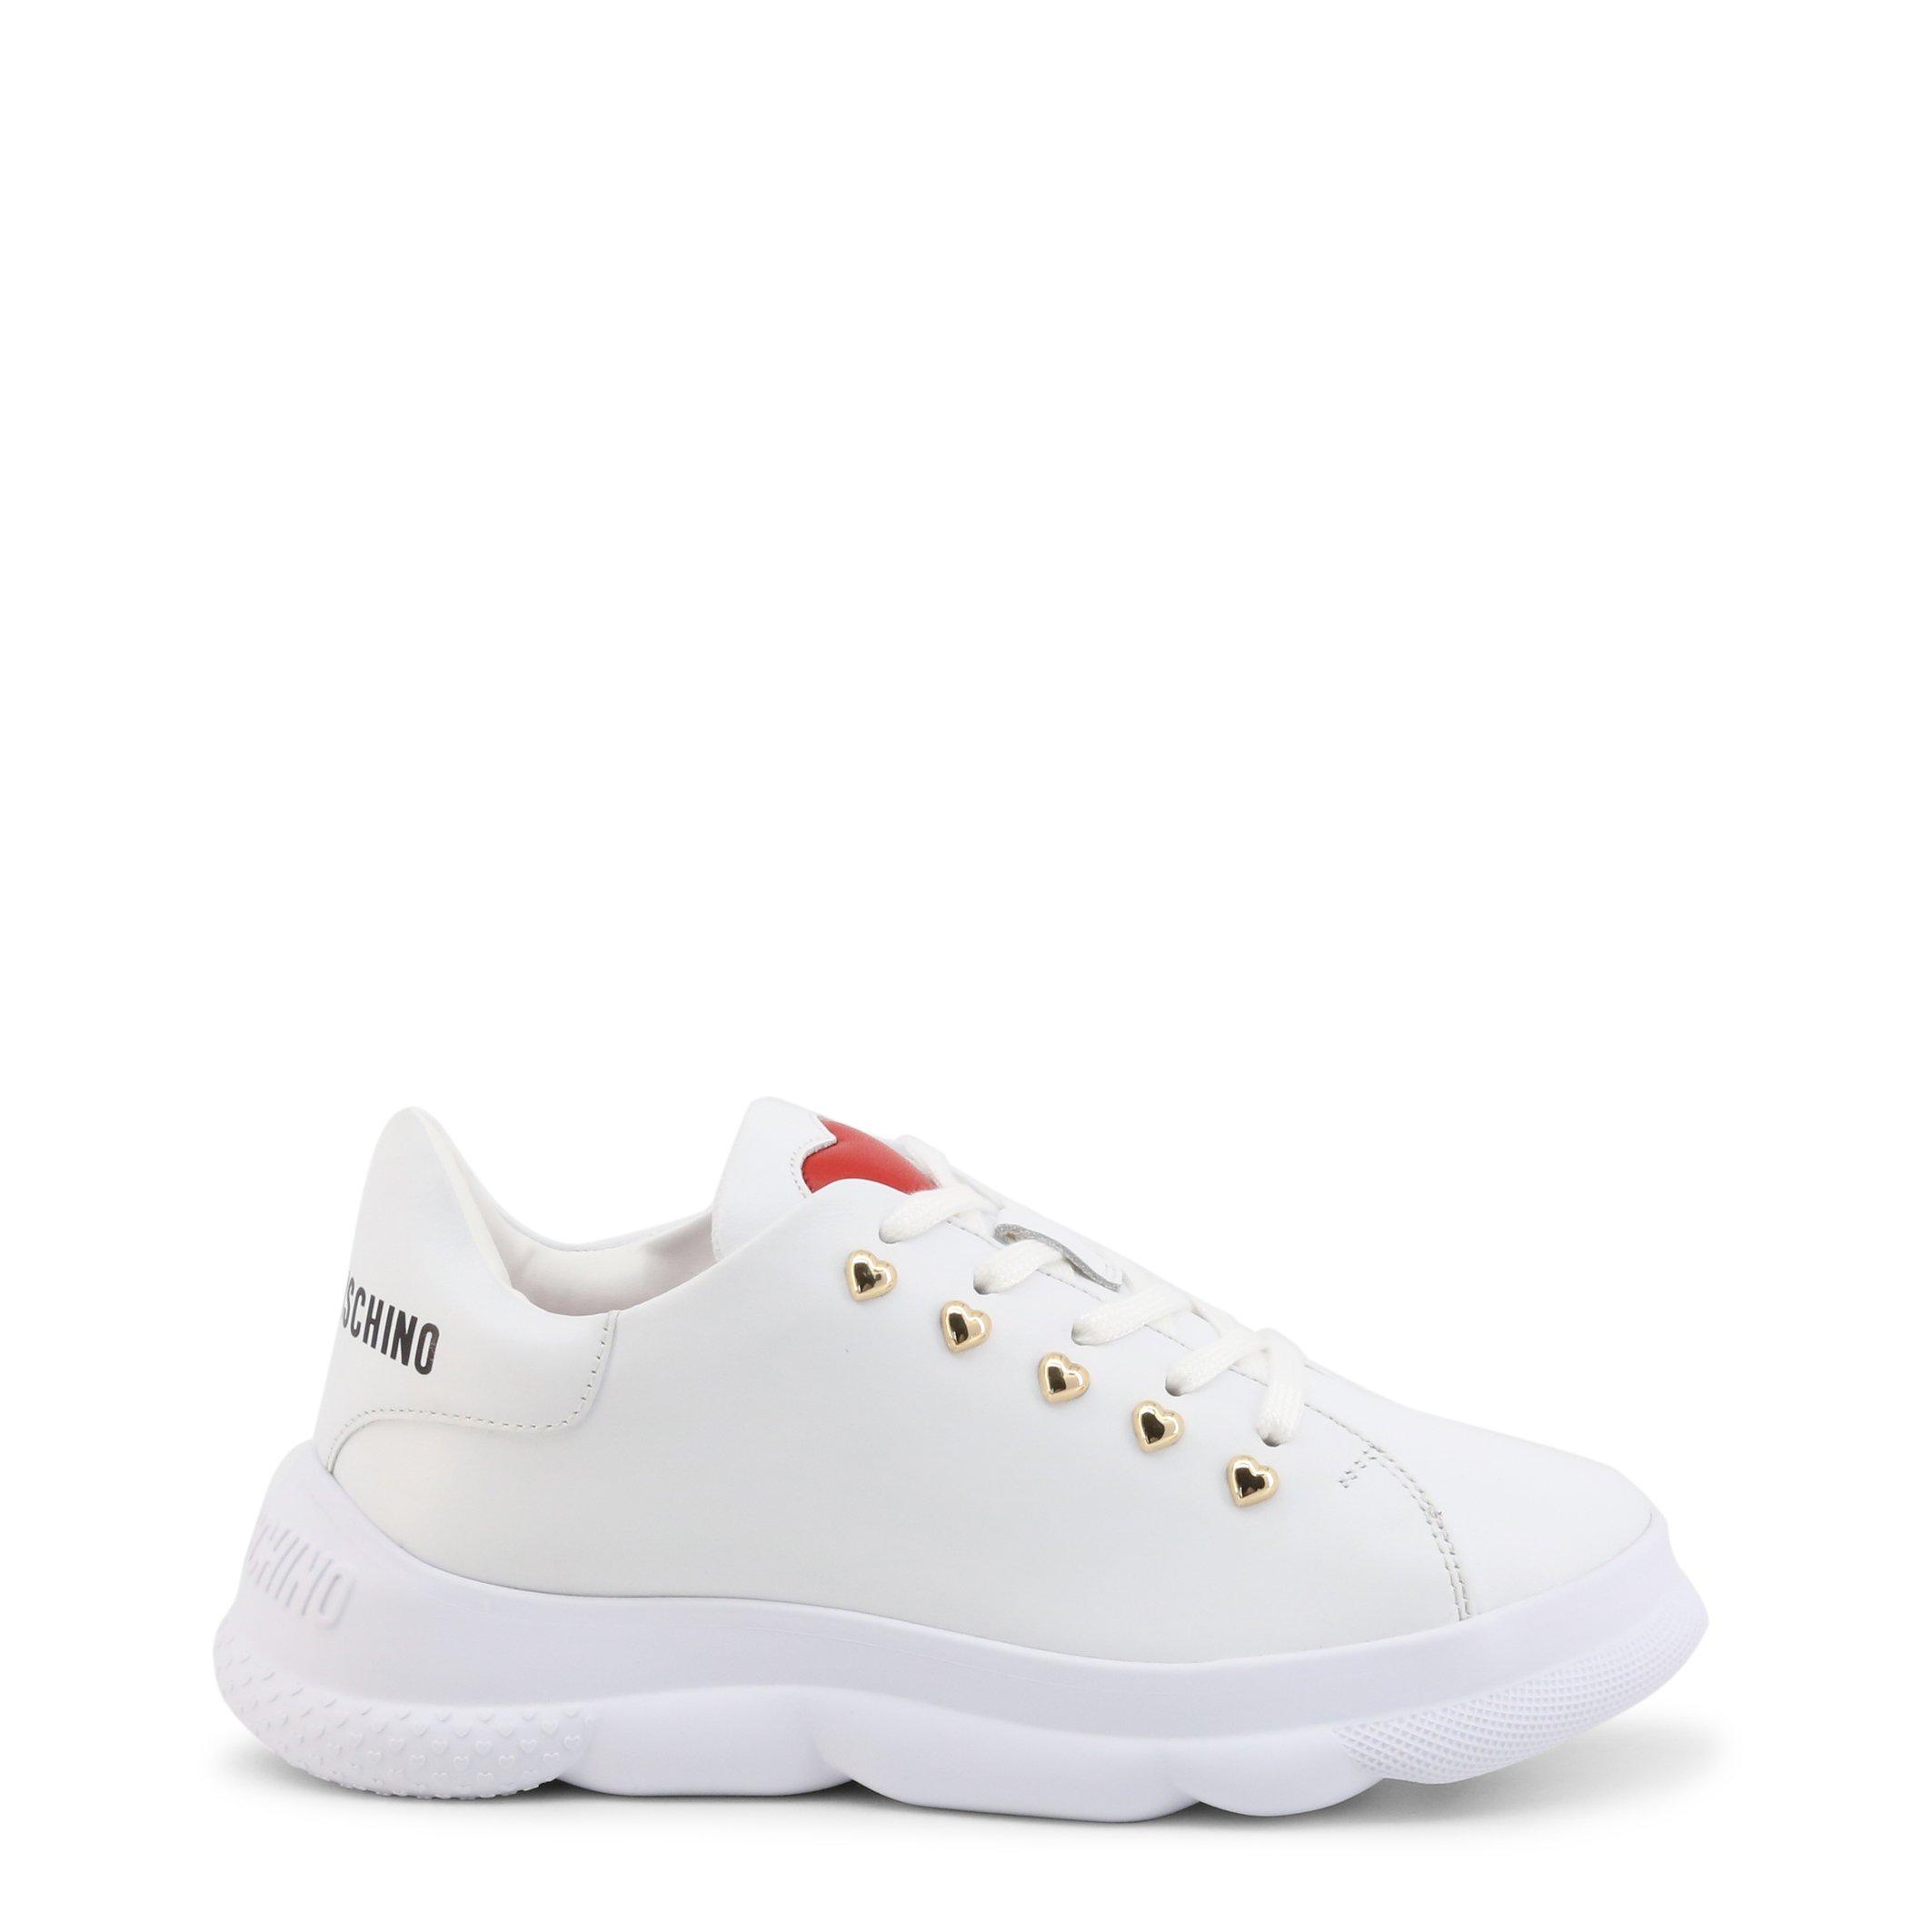 Love Moschino Women's Trainer Various Colours JA15374G0CJA0 - white EU 35